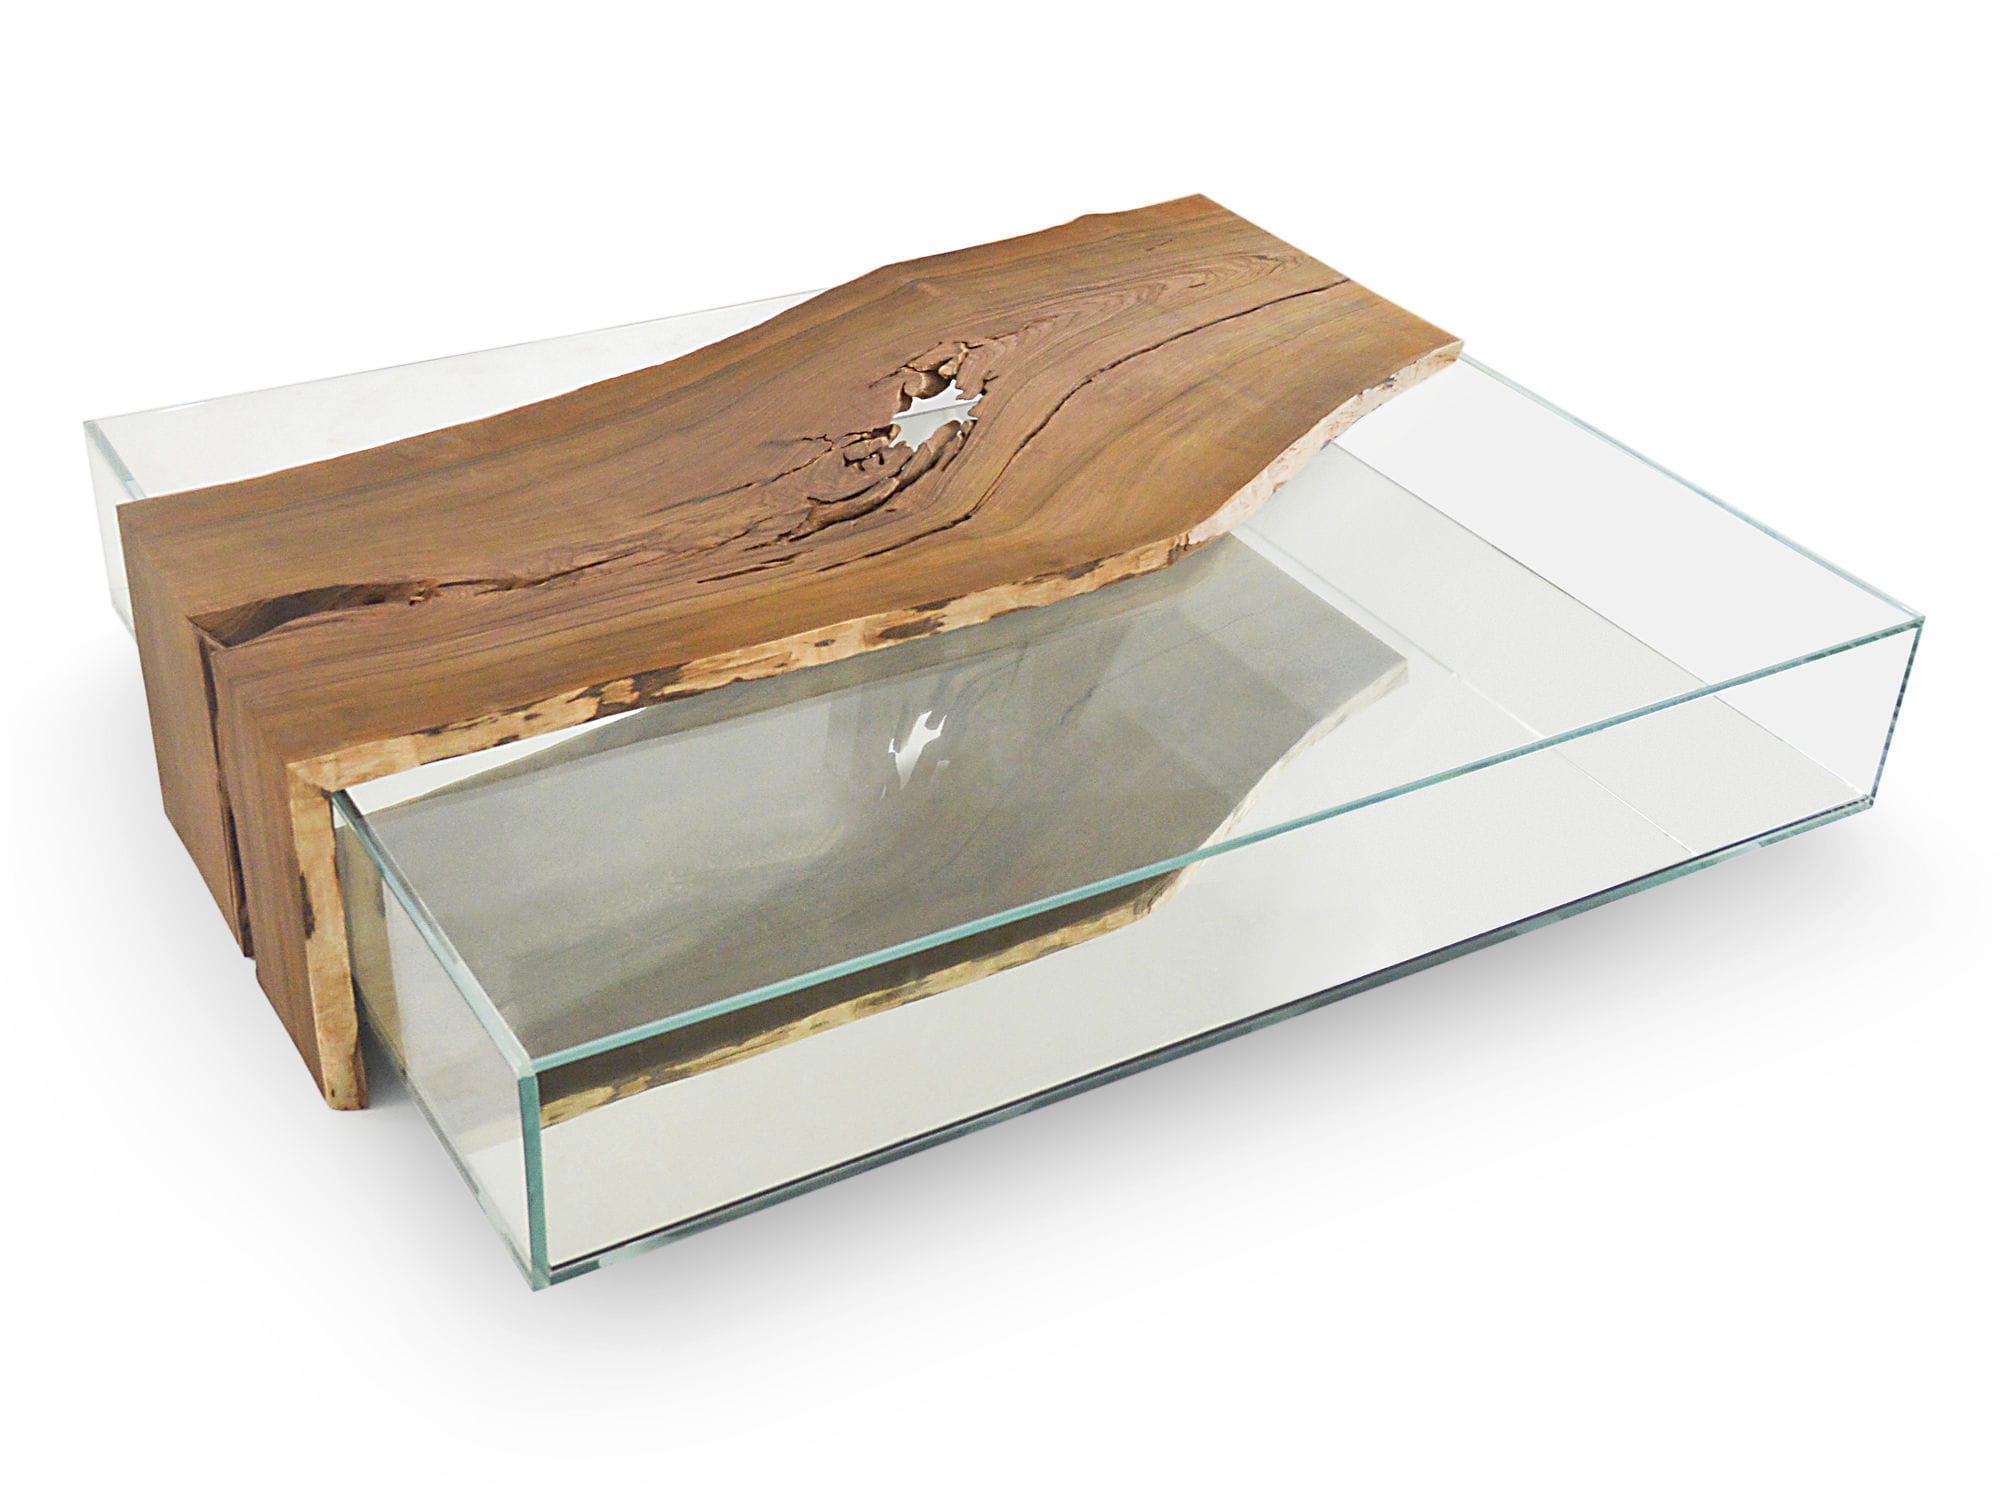 Moderner Couchtisch Glas Massivholz Rechteckig Cocobolo